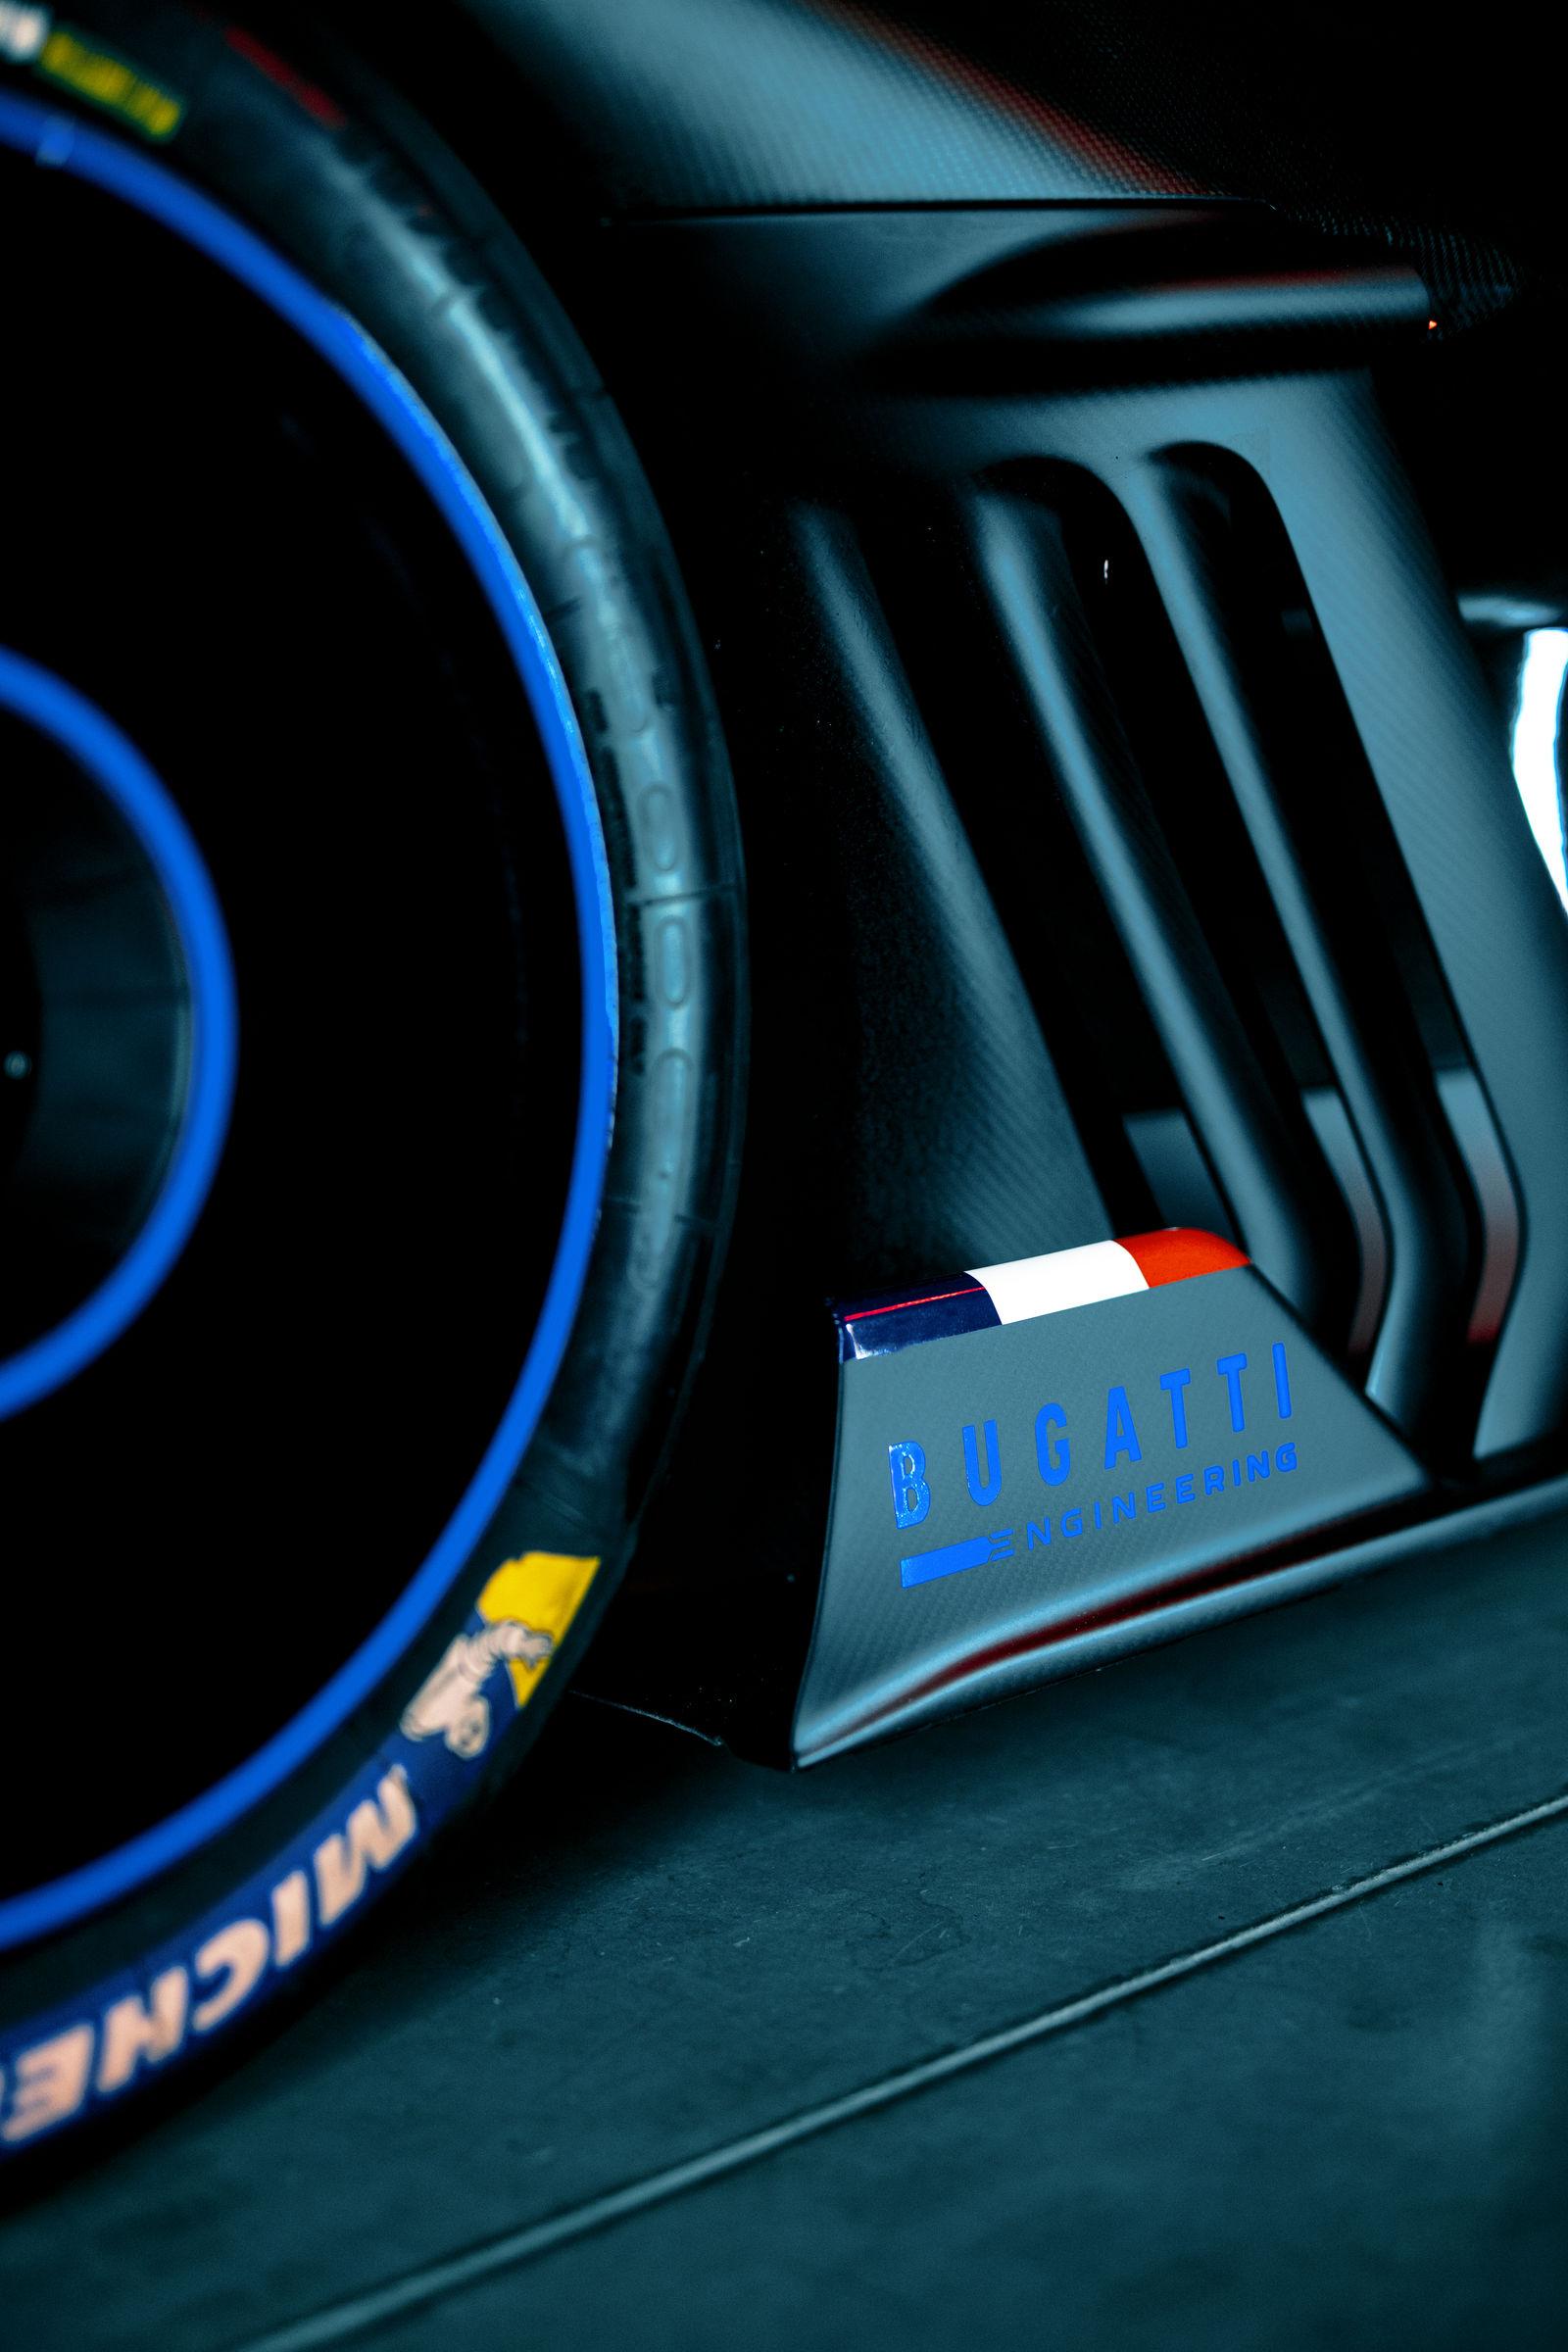 Bugatti-Bolide-concept-photos-21